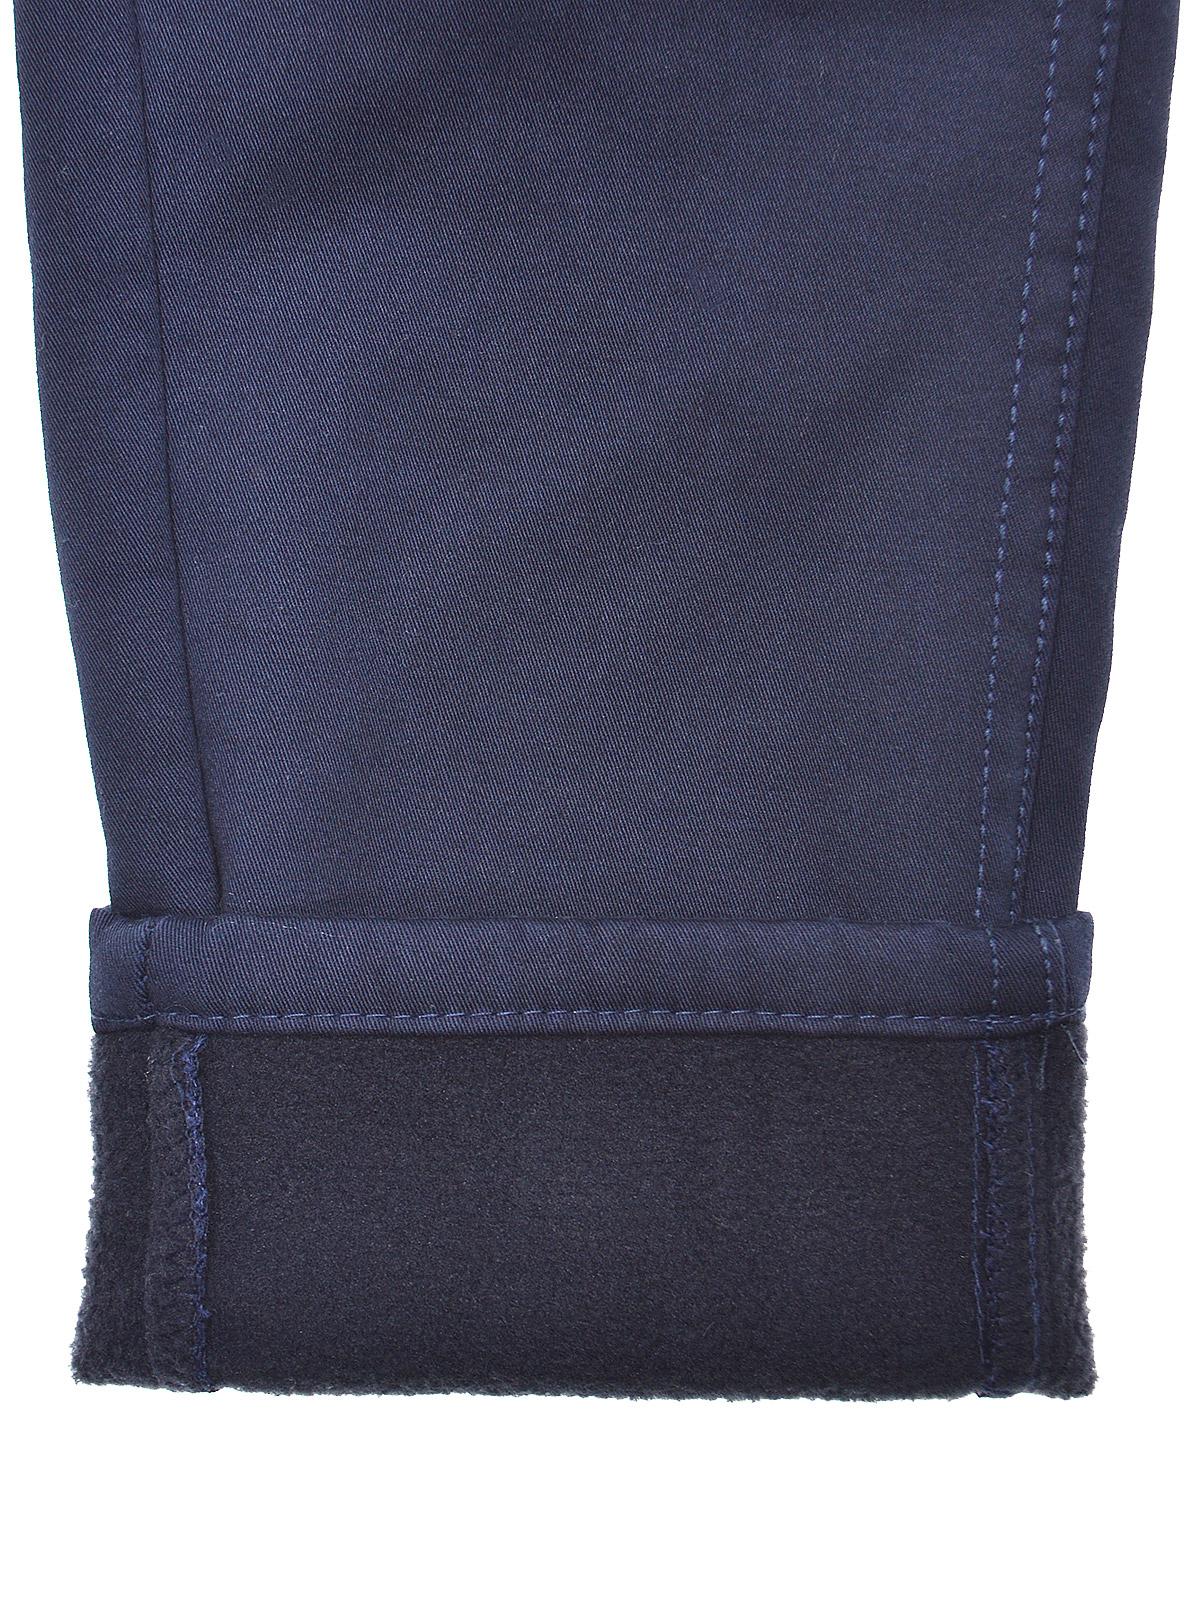 Enfants-Chino-THERMO-d-039-hiver-Pantalons-Garcons-Pantalon-Doublure-Stretch-Reglable-22904 miniature 4